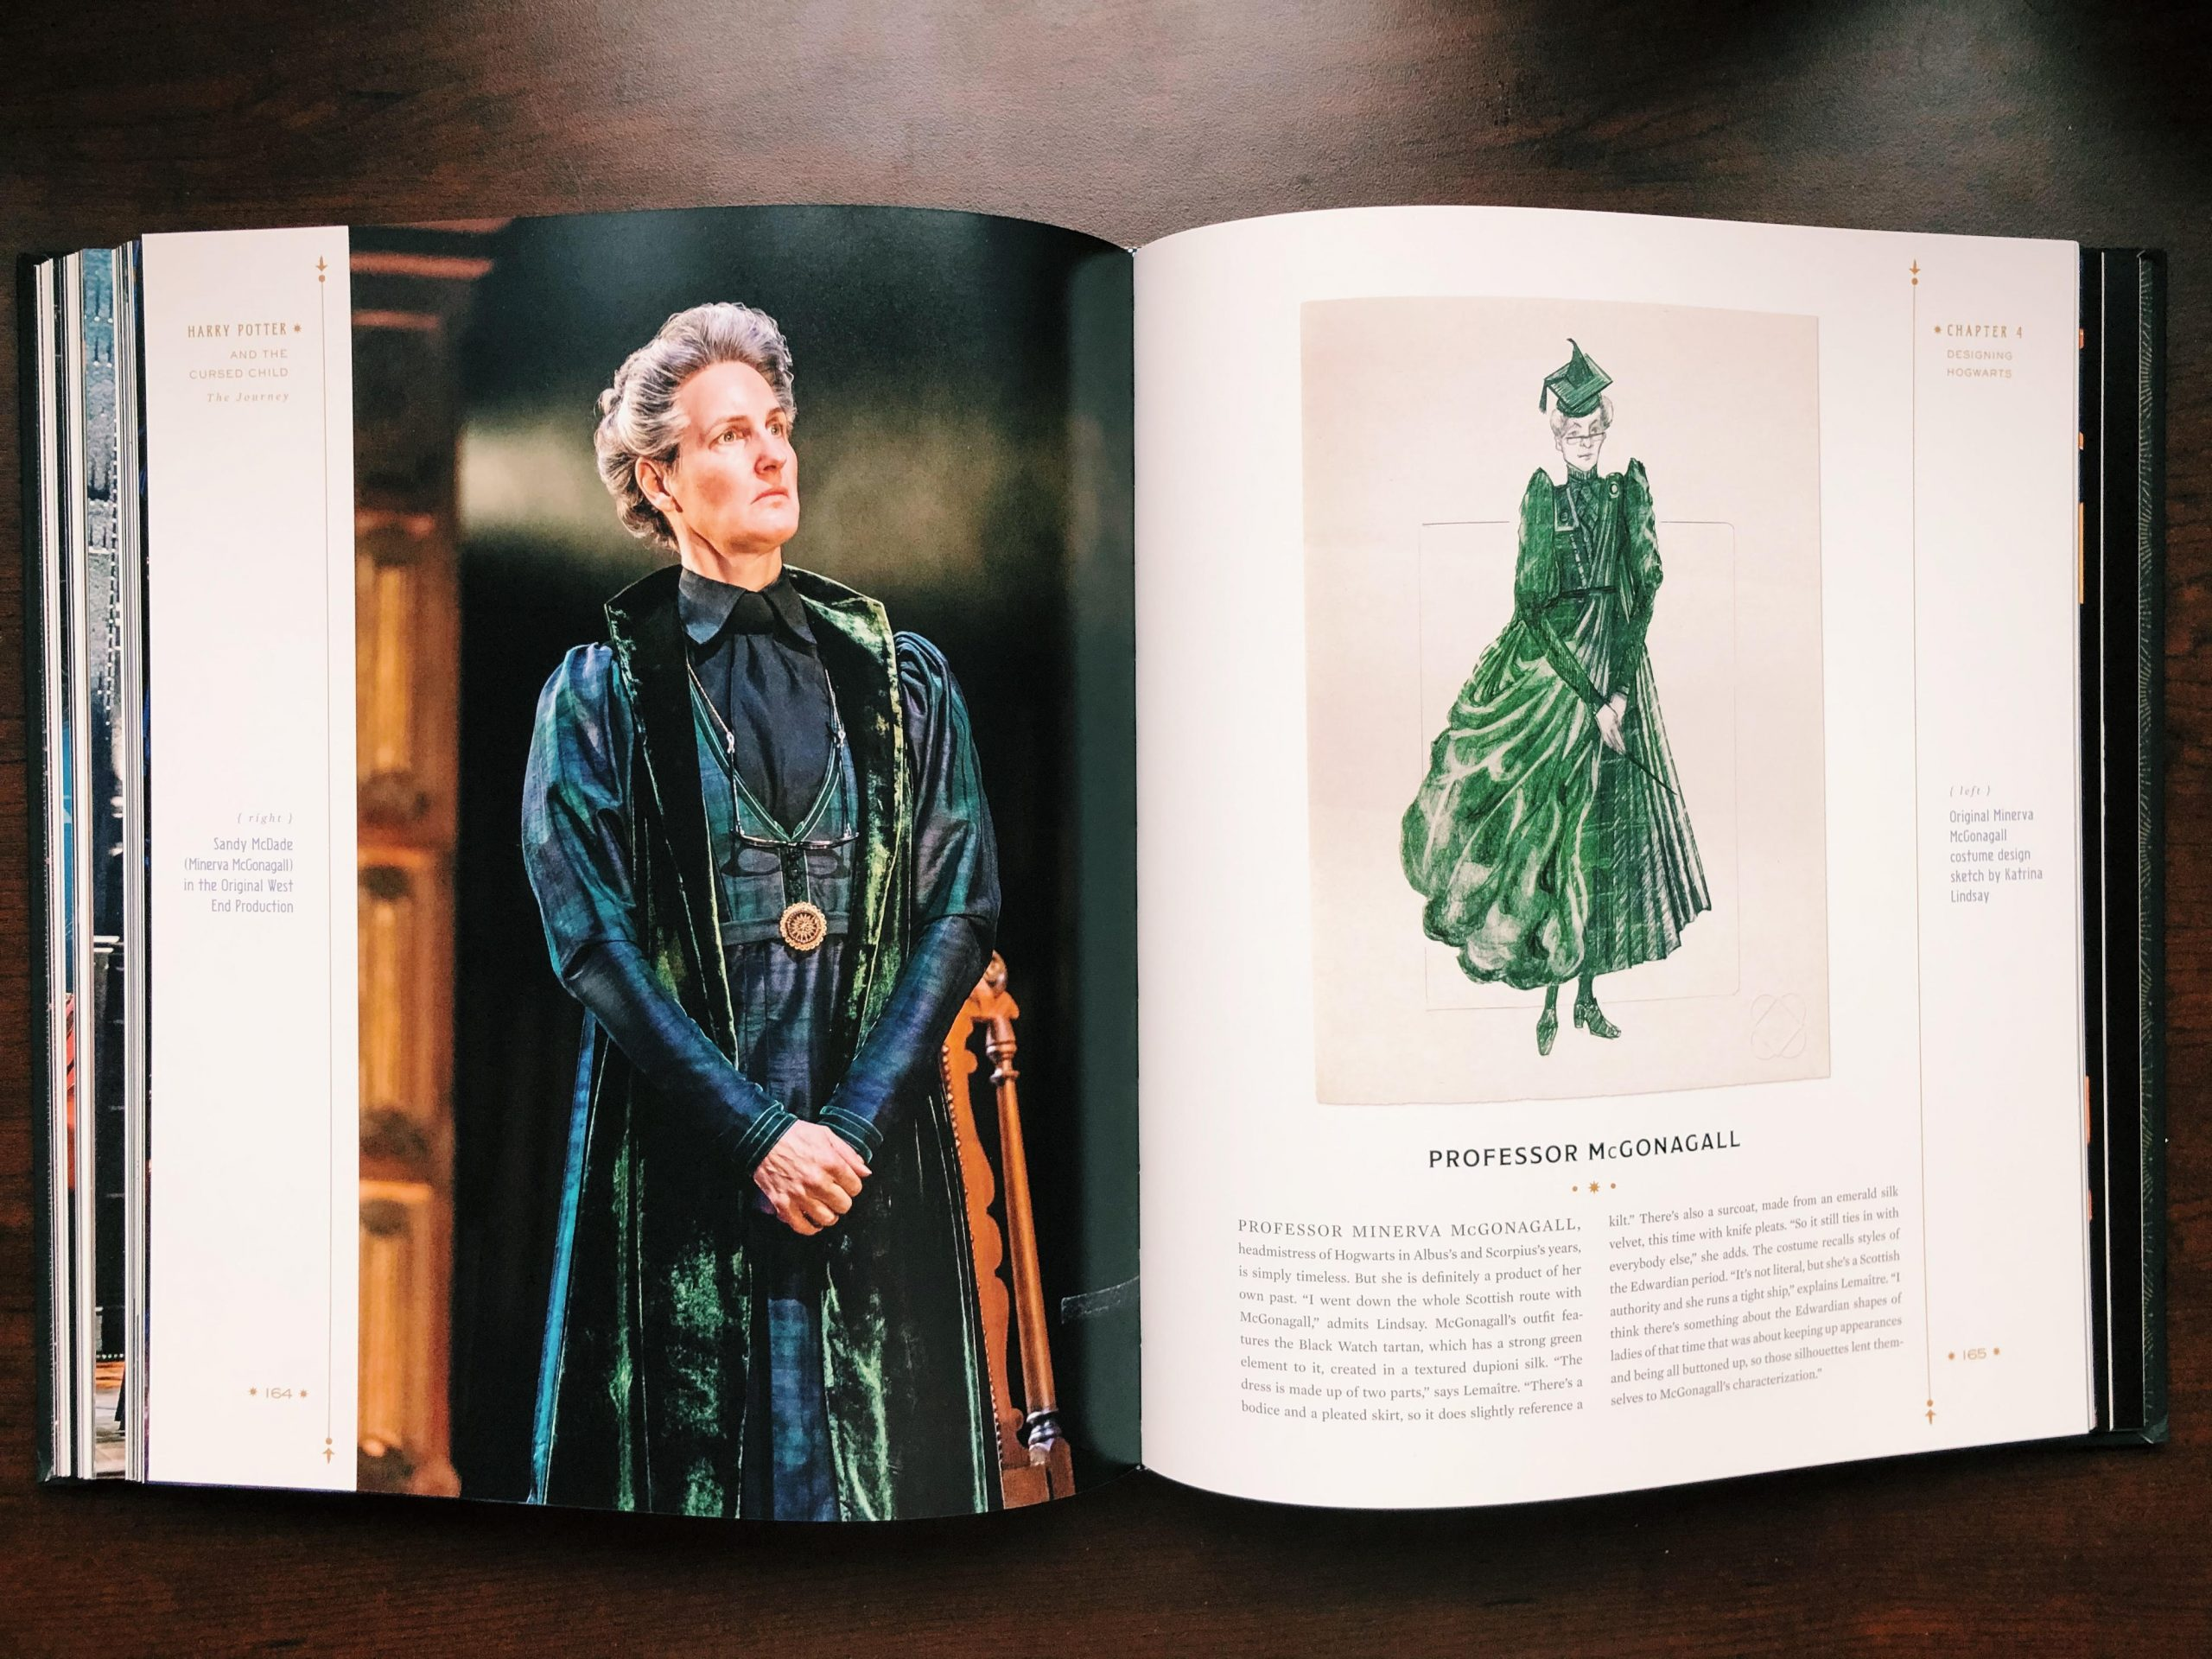 Costume designer Katrina Lindsay explains the inspiration behind McGonagall's look.